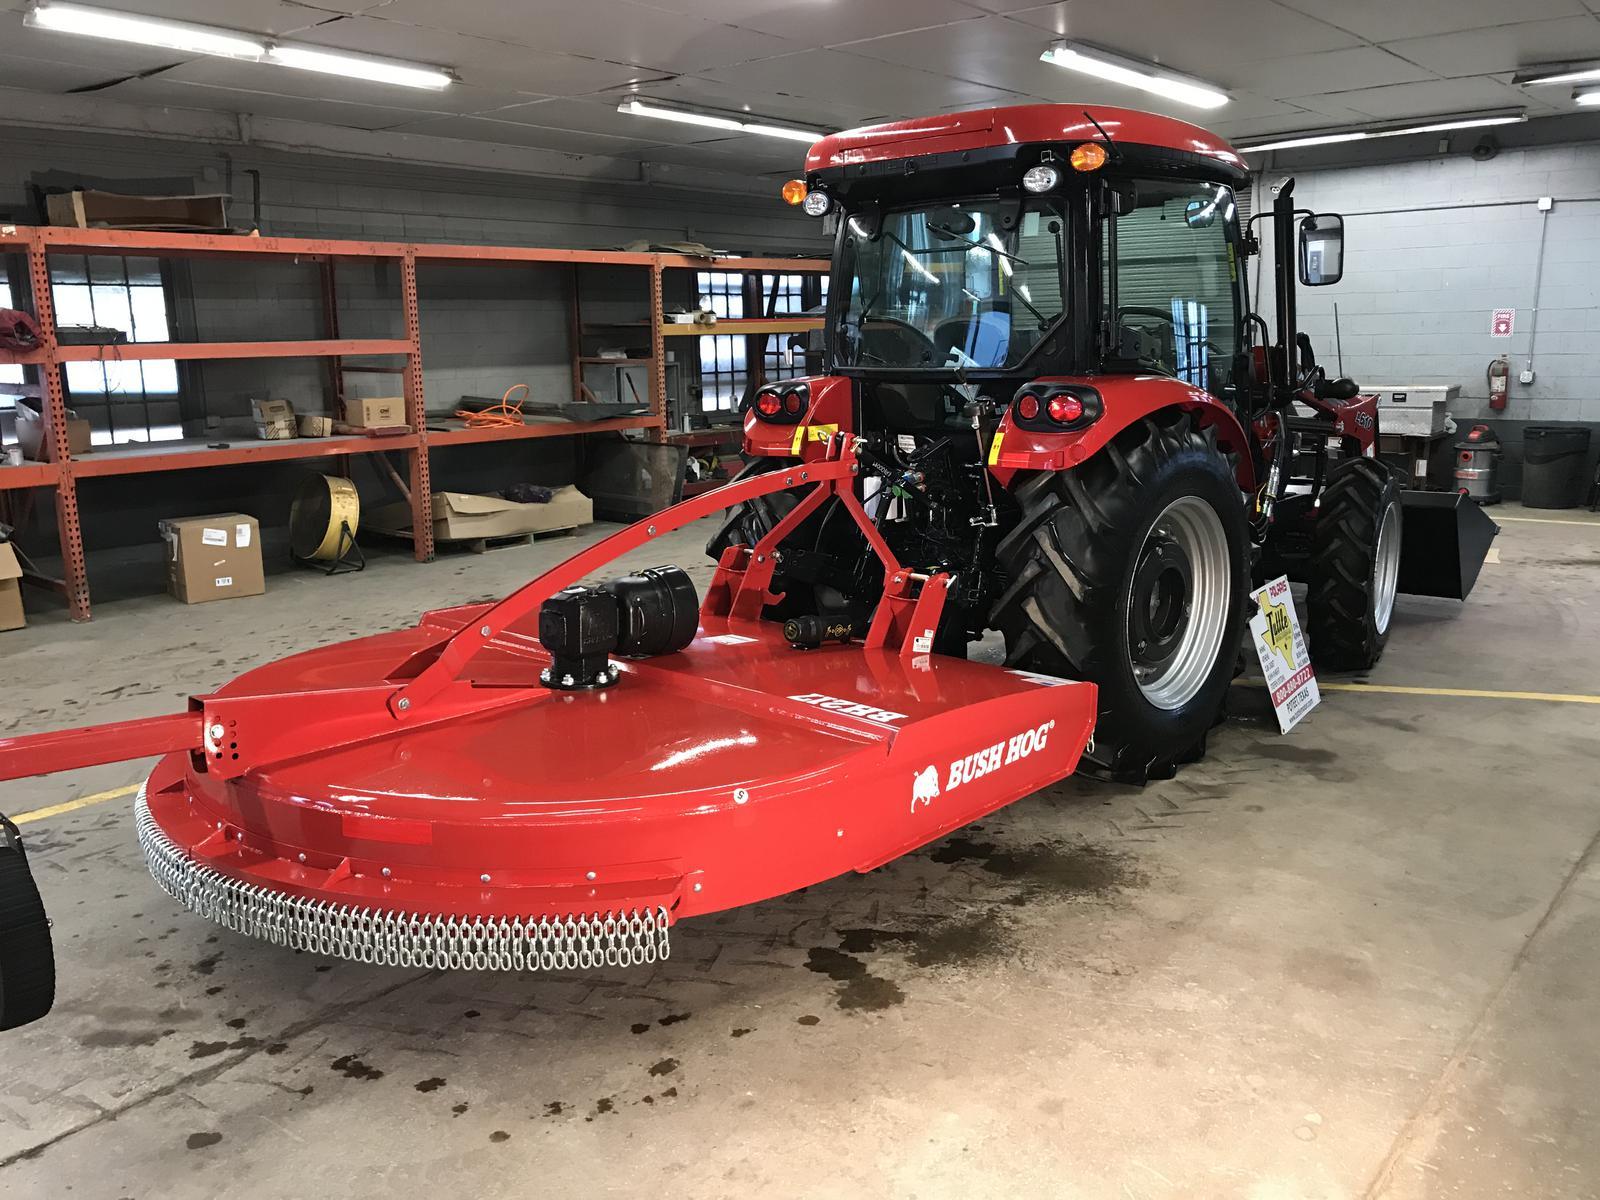 2019 Bush Hog BH217 for sale in Poteet, TX  Tuttle Motor